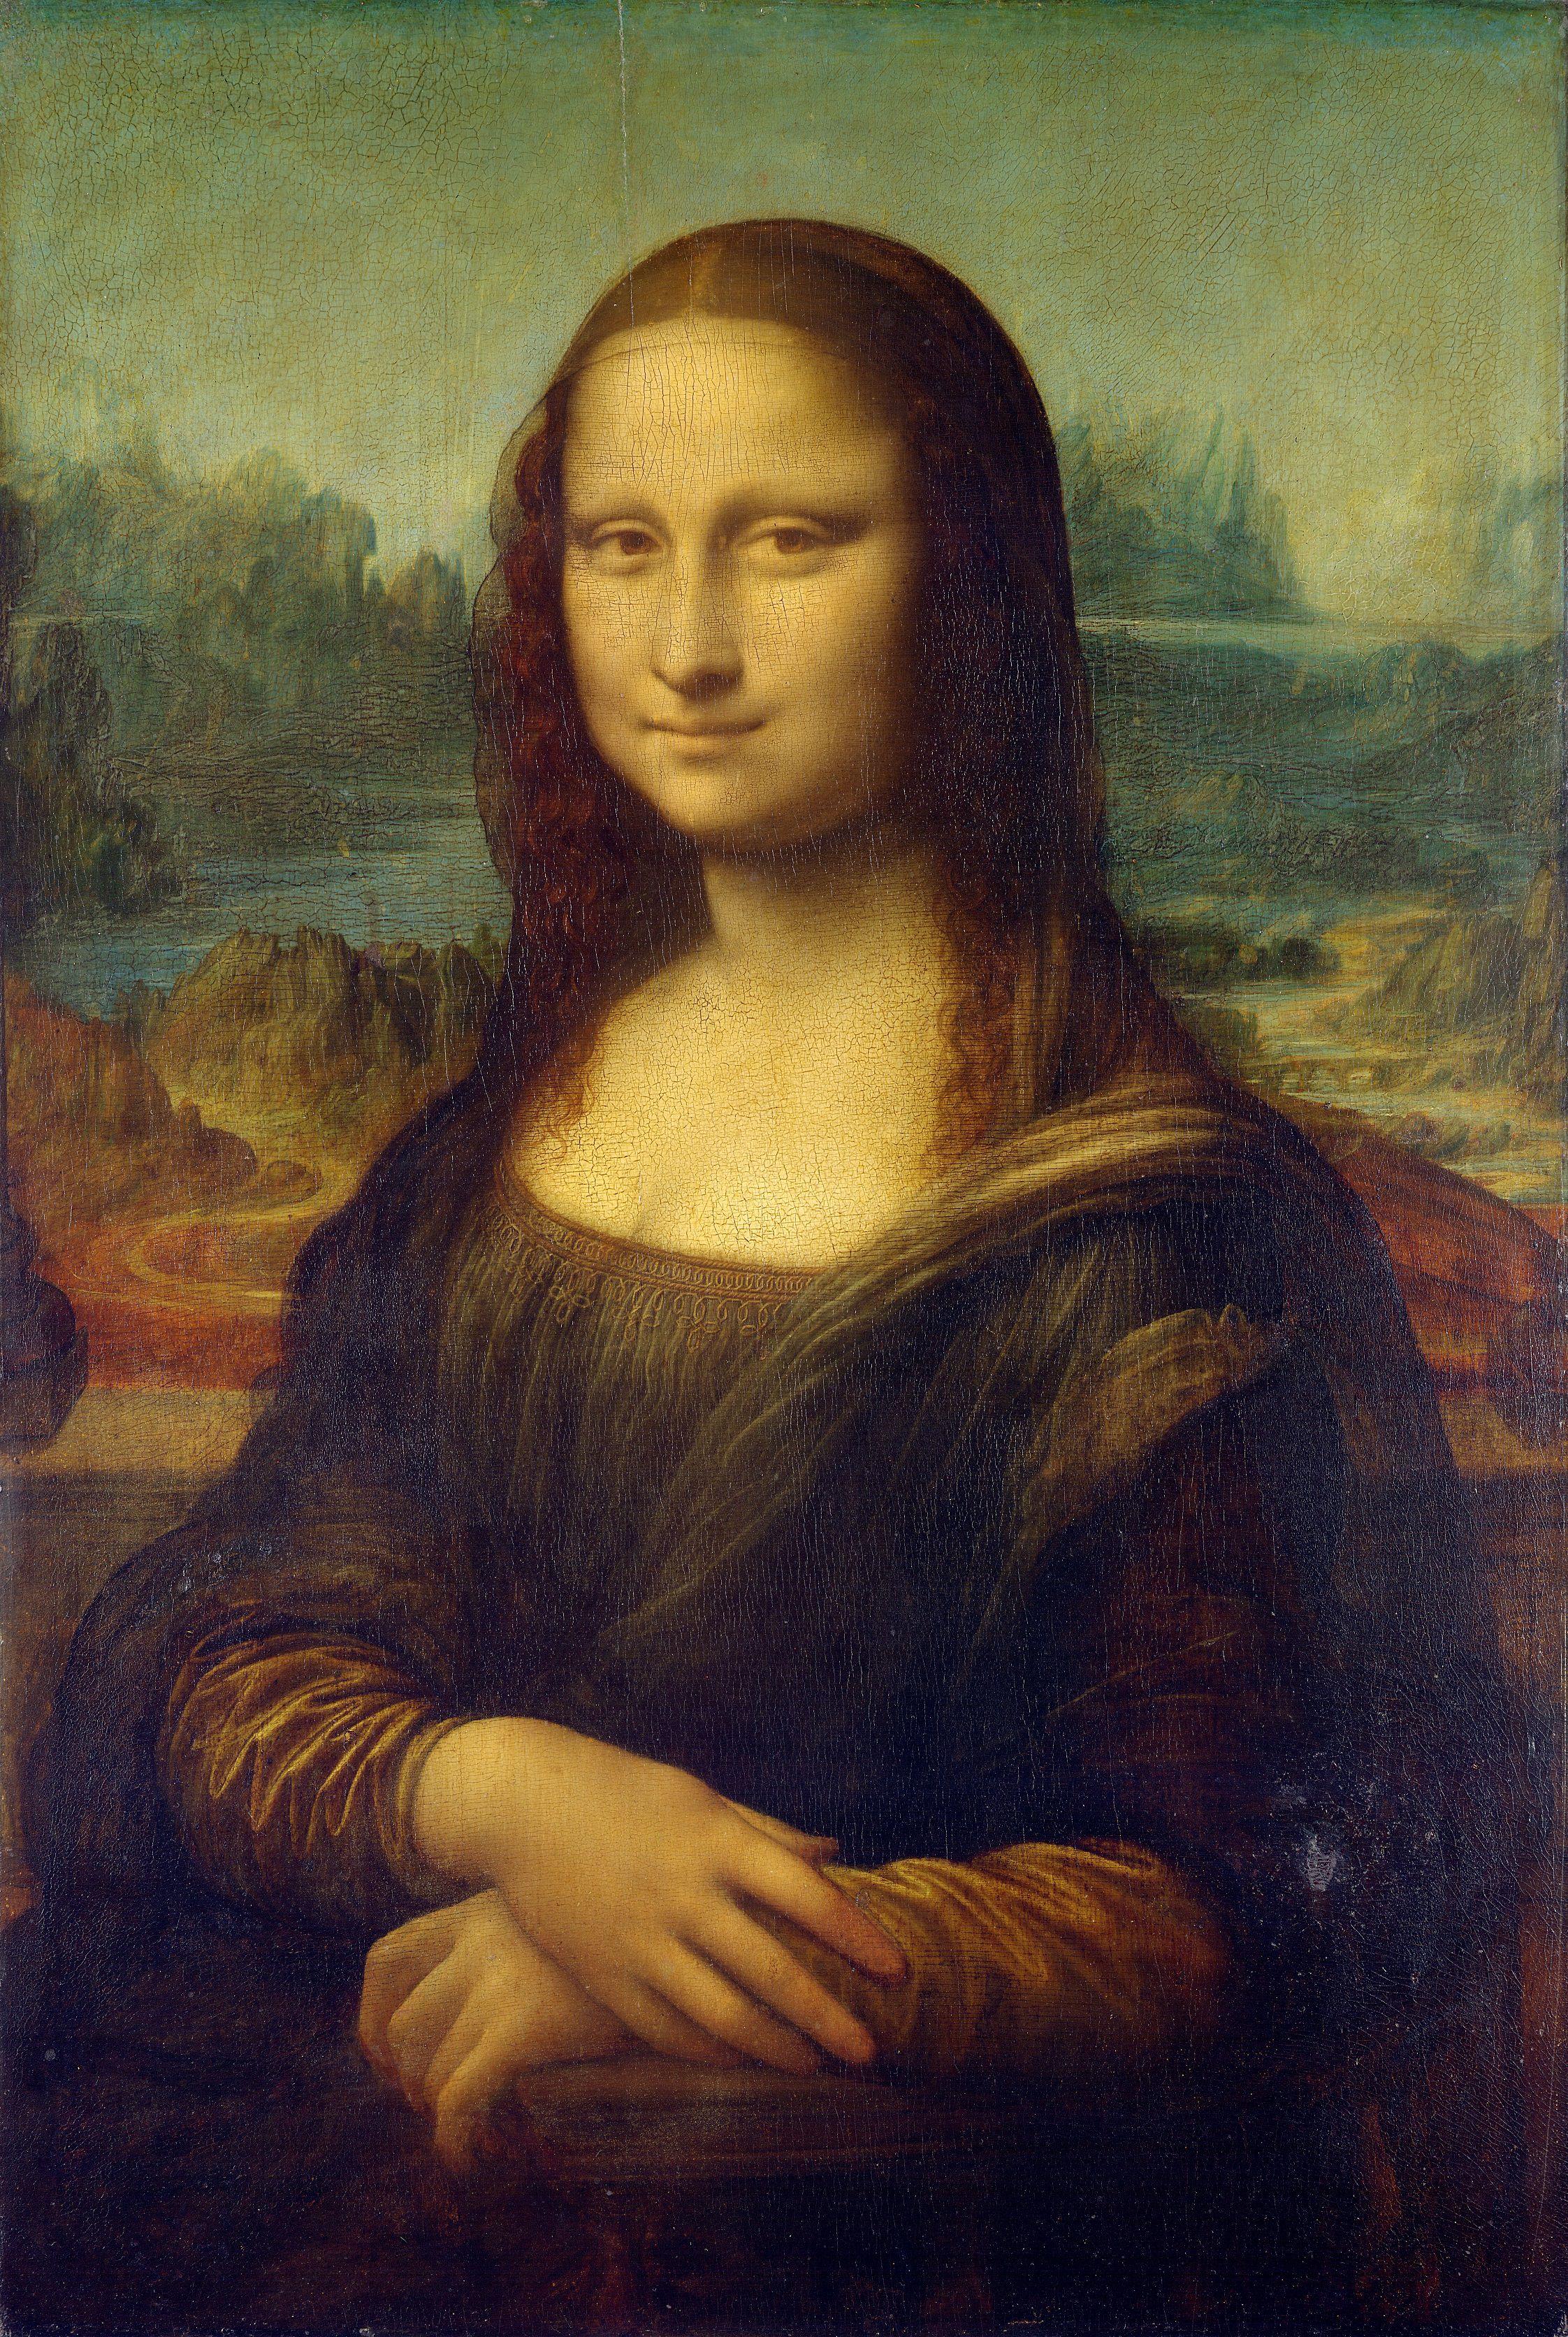 Cuadros Famosos Faciles.Las 10 Pinturas Mas Famosas Del Mundo